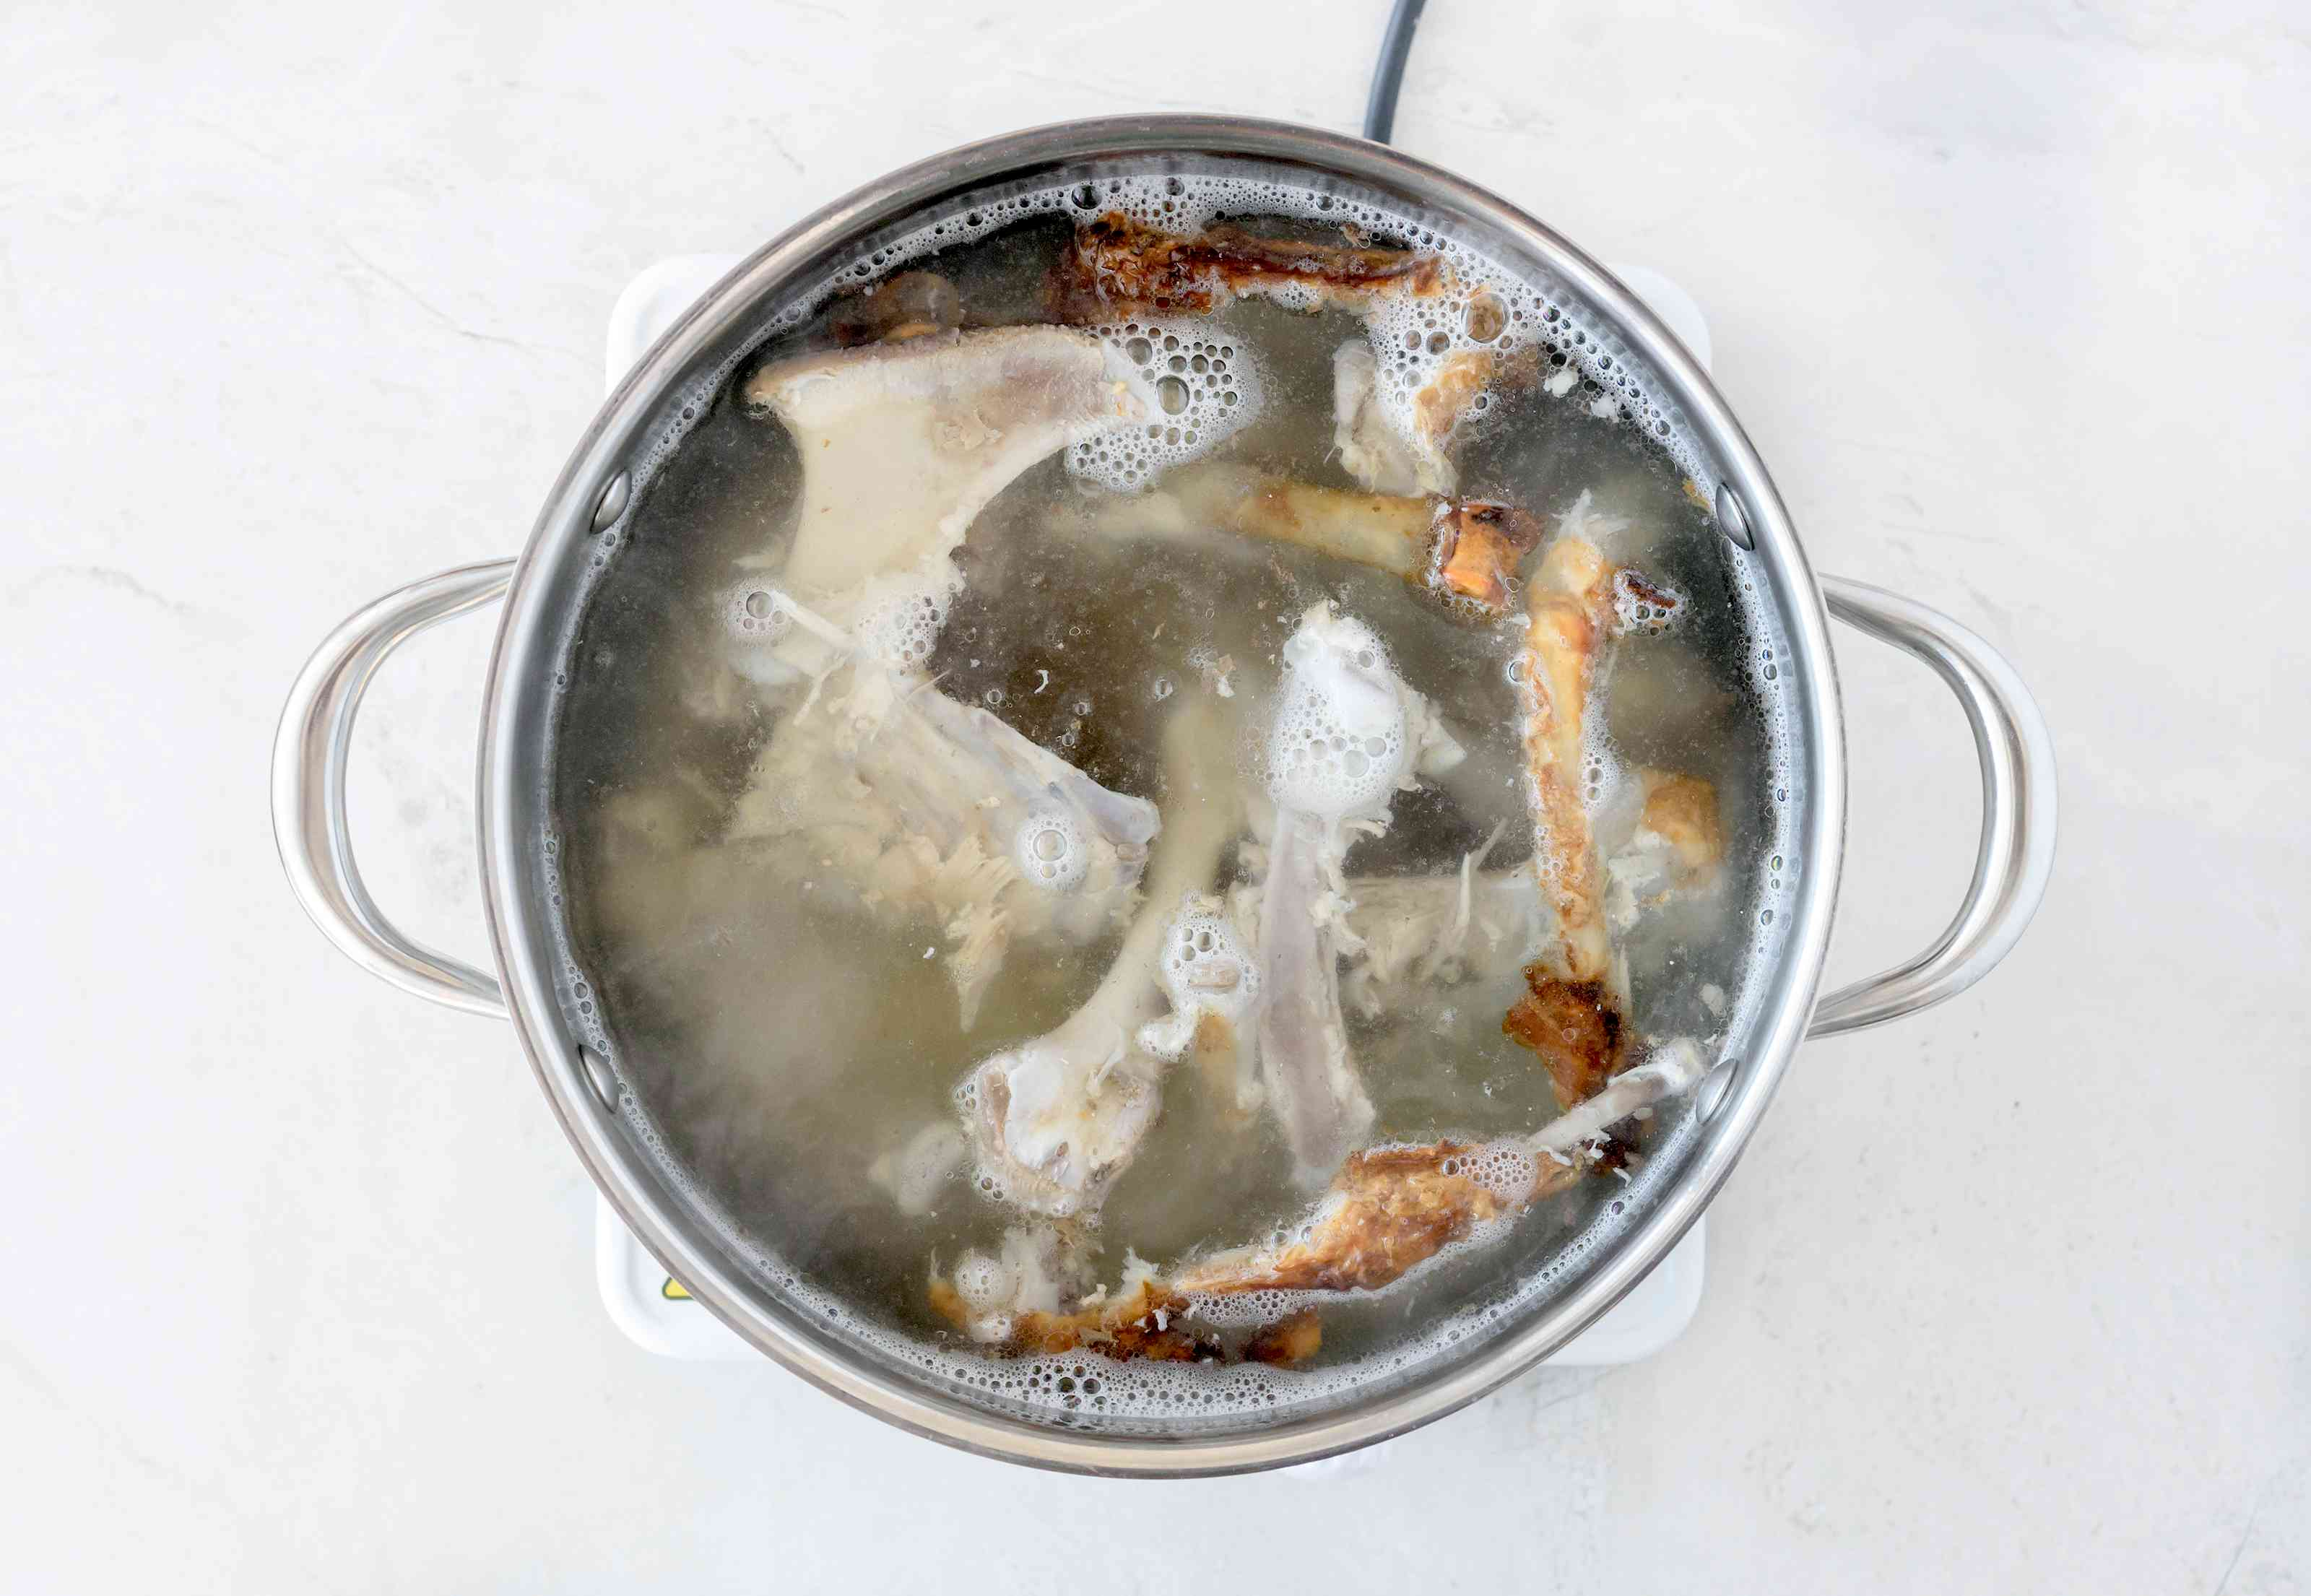 Bring pot to boil